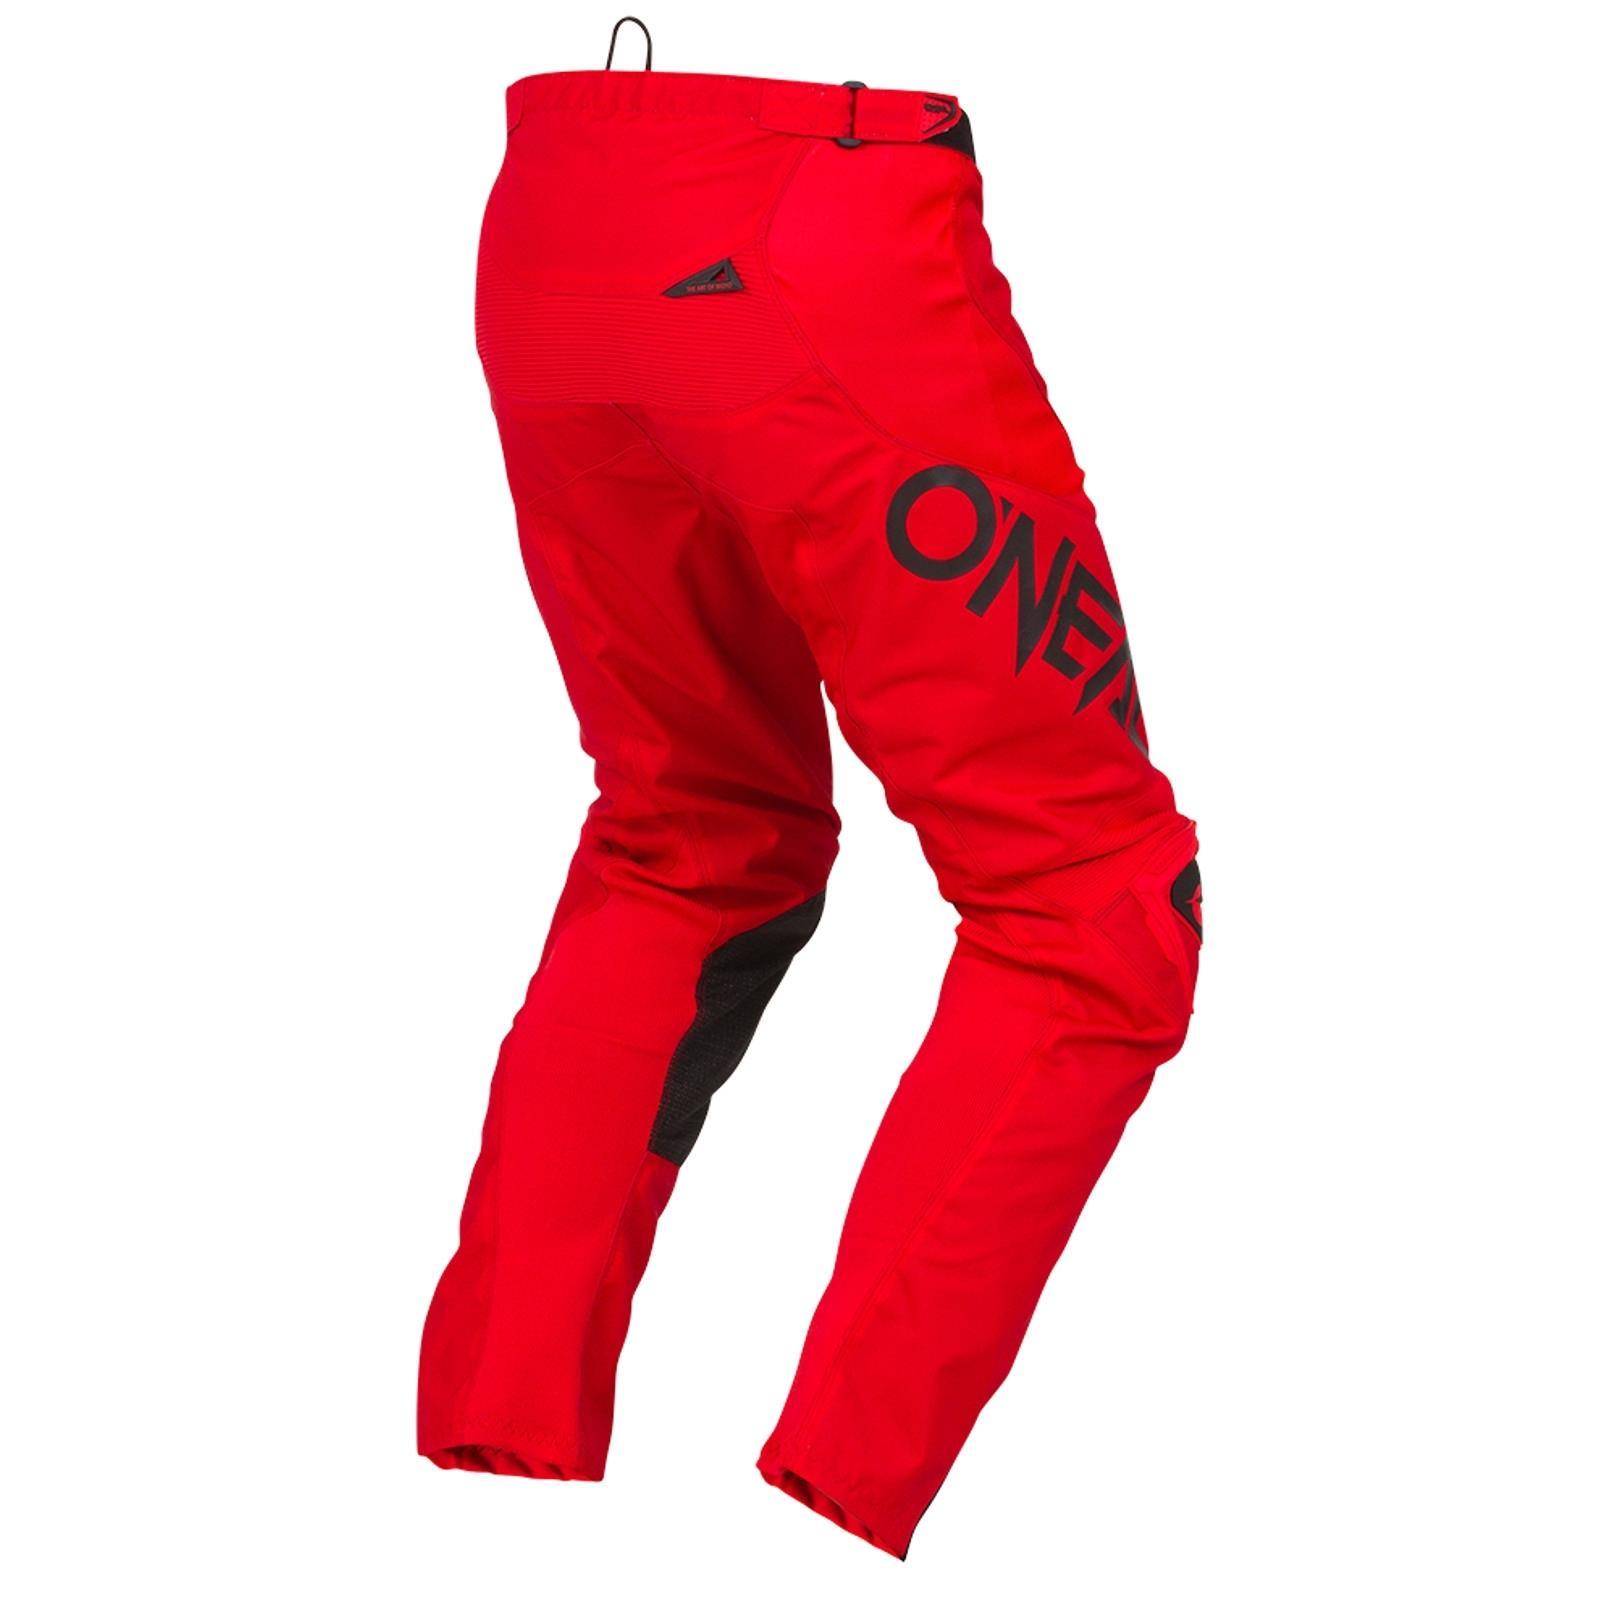 Oneal-elemento-Mayhem-Hardwear-Pants-pantalones-MX-DH-FR-Moto-Cross-Enduro-MTB-moto miniatura 57